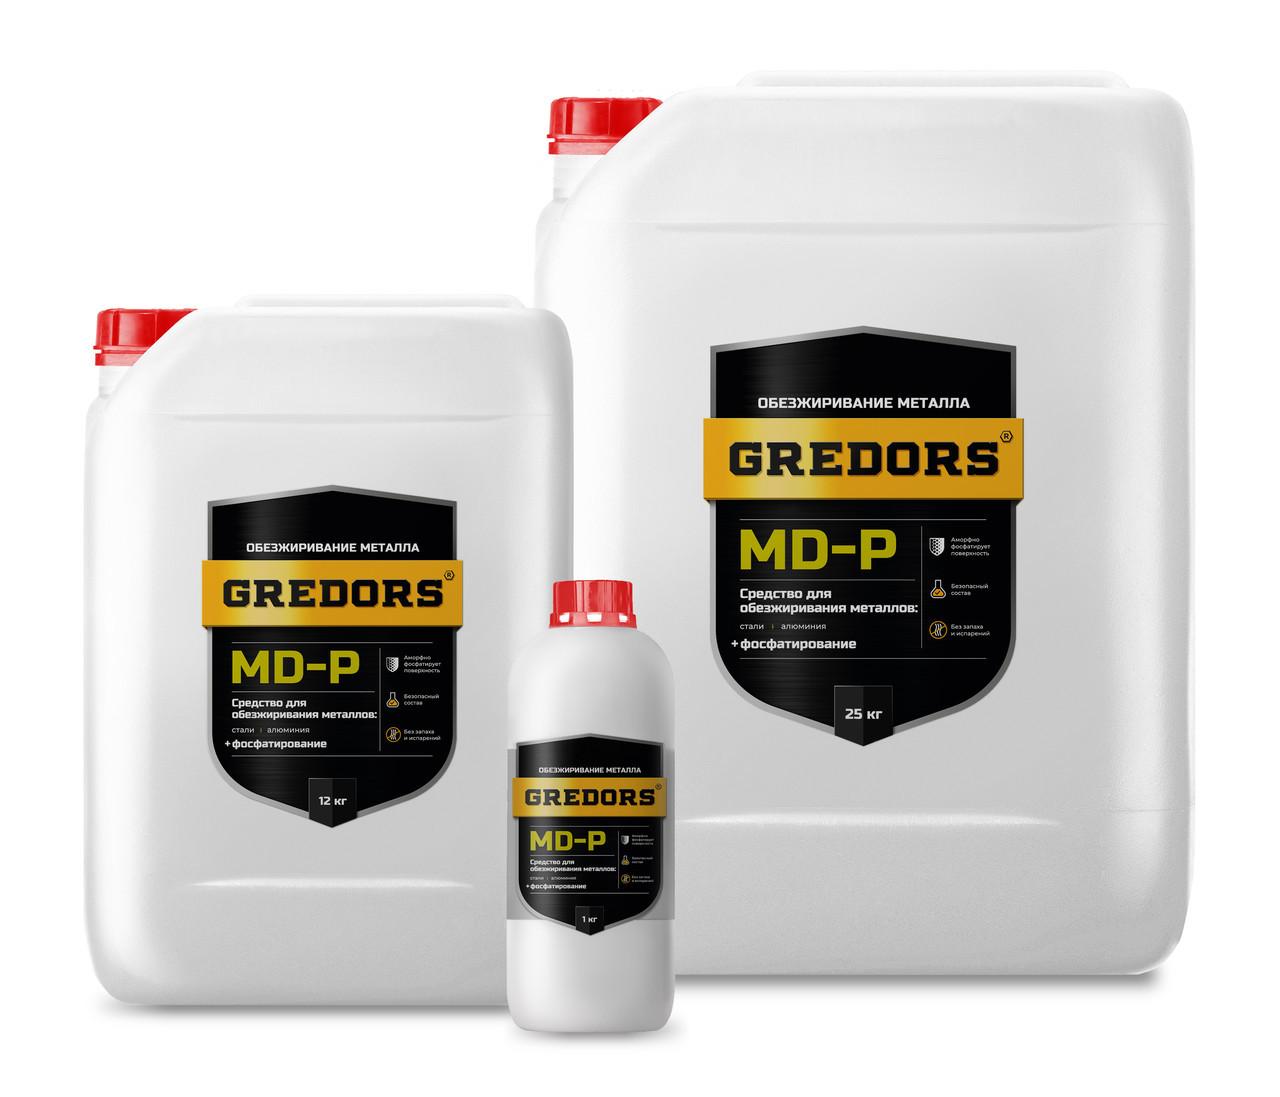 GREDORS MD-P – средство для обезжиривания и фосфатирования металлов